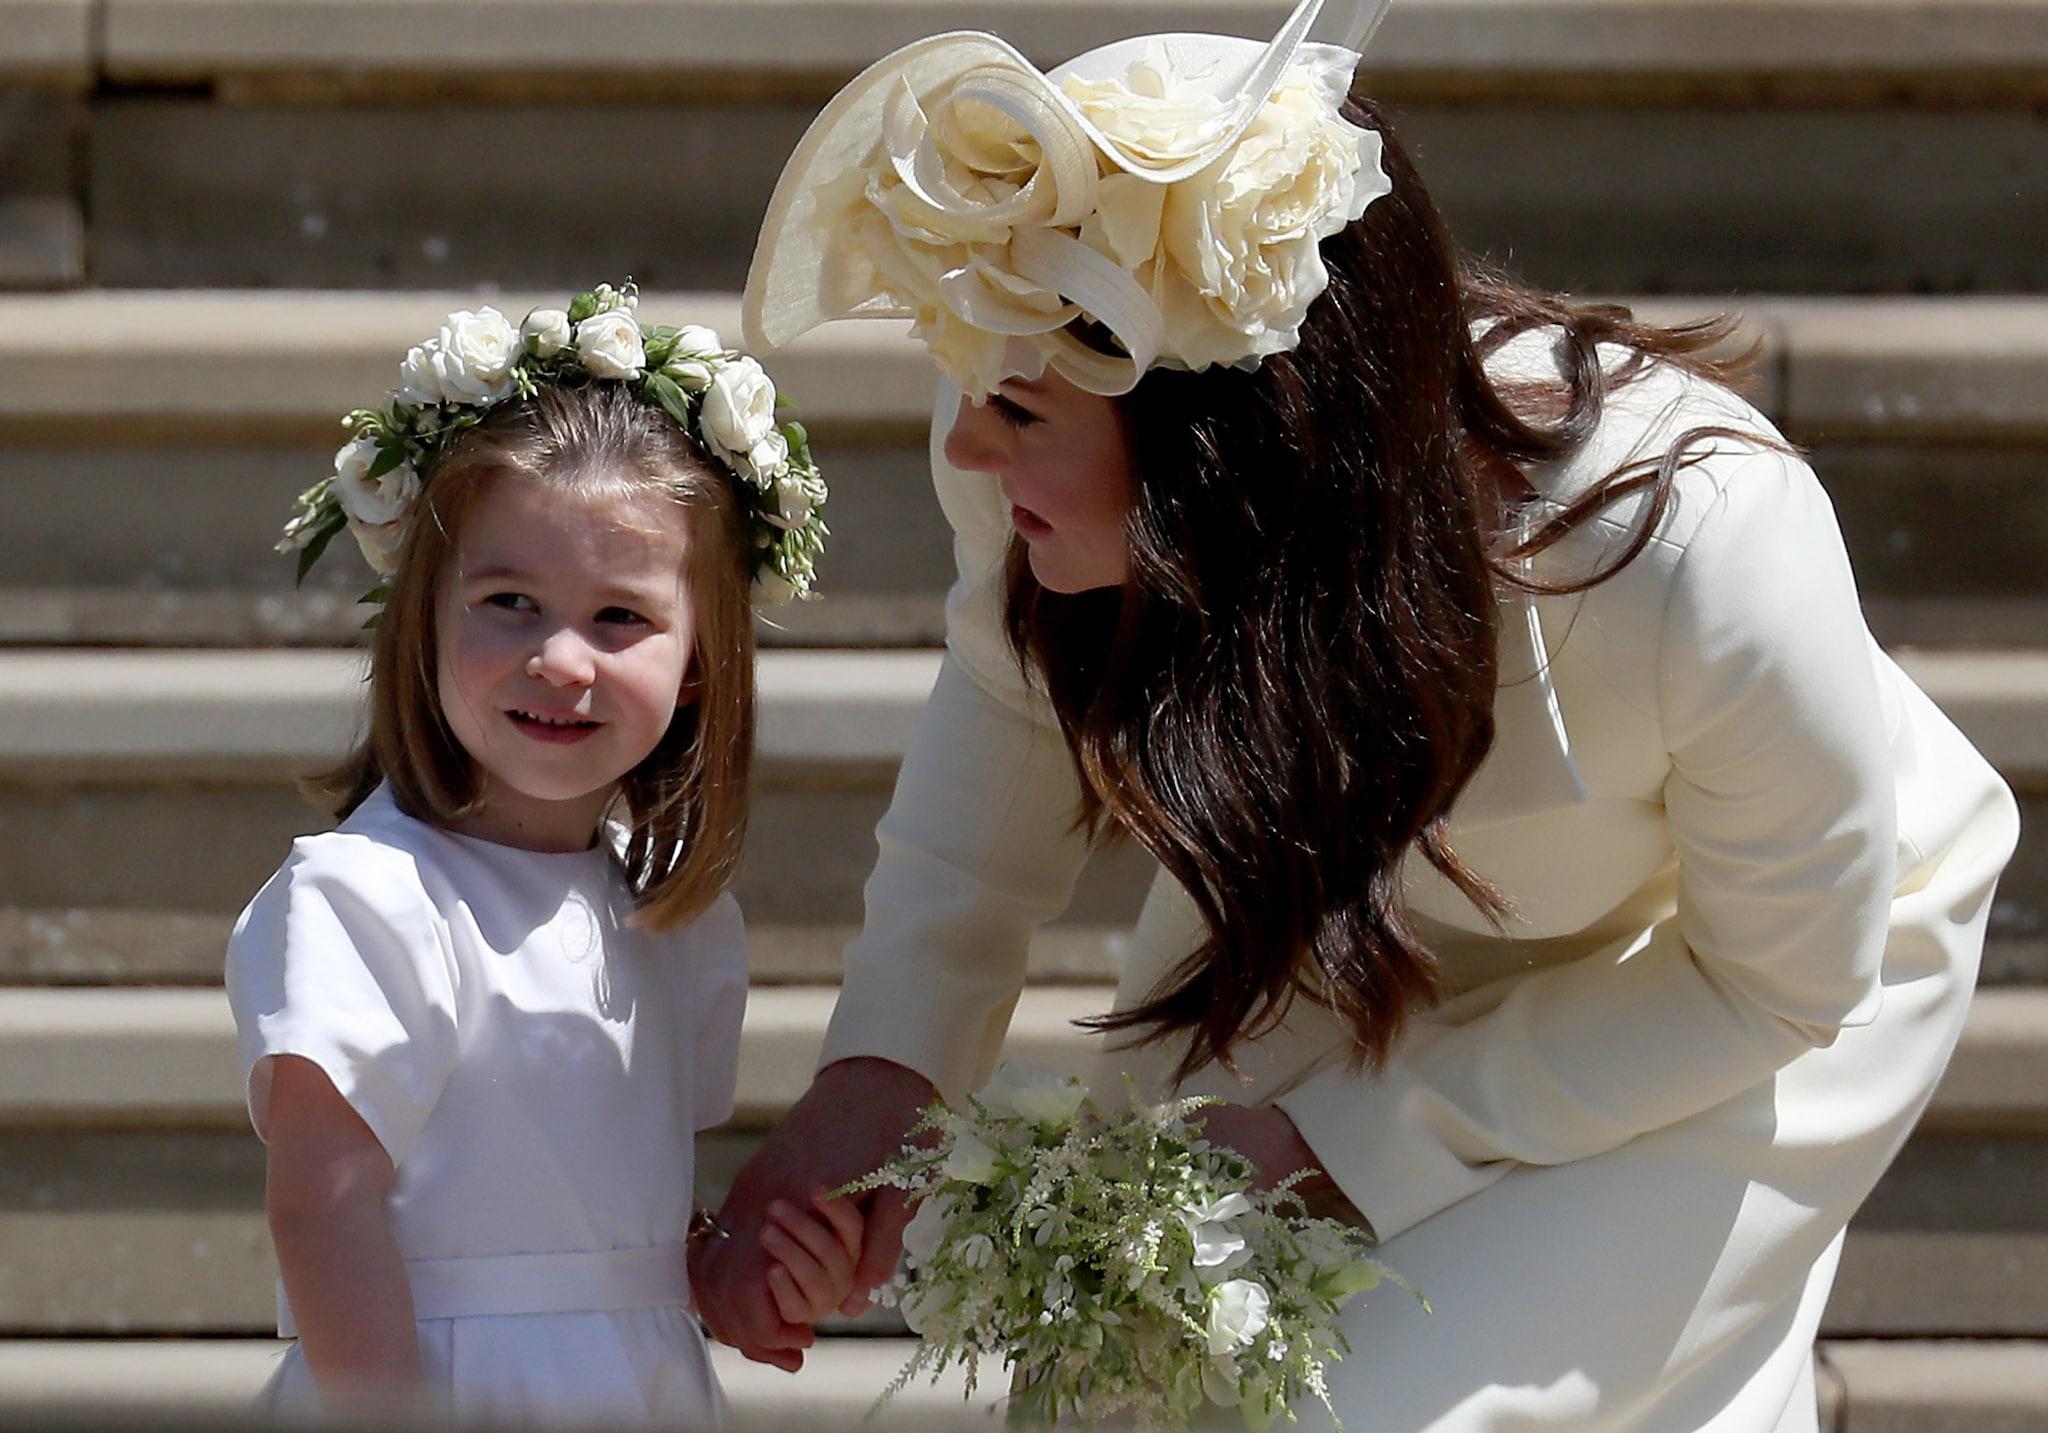 Charlotte di Cambridge con Kate Middleton